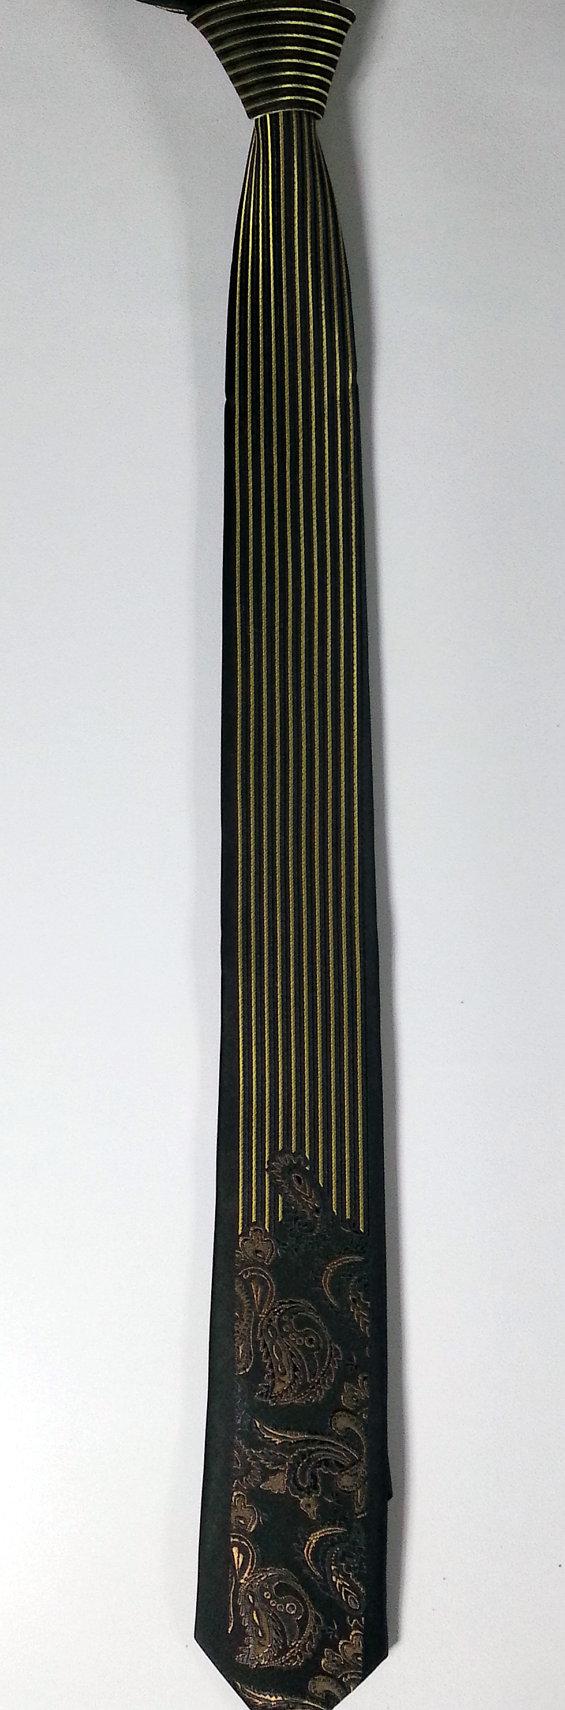 Tie Black Tie Men's Necktie Black Cravat PP144056 by PeraTime #handmadeatamazon #nazodesign